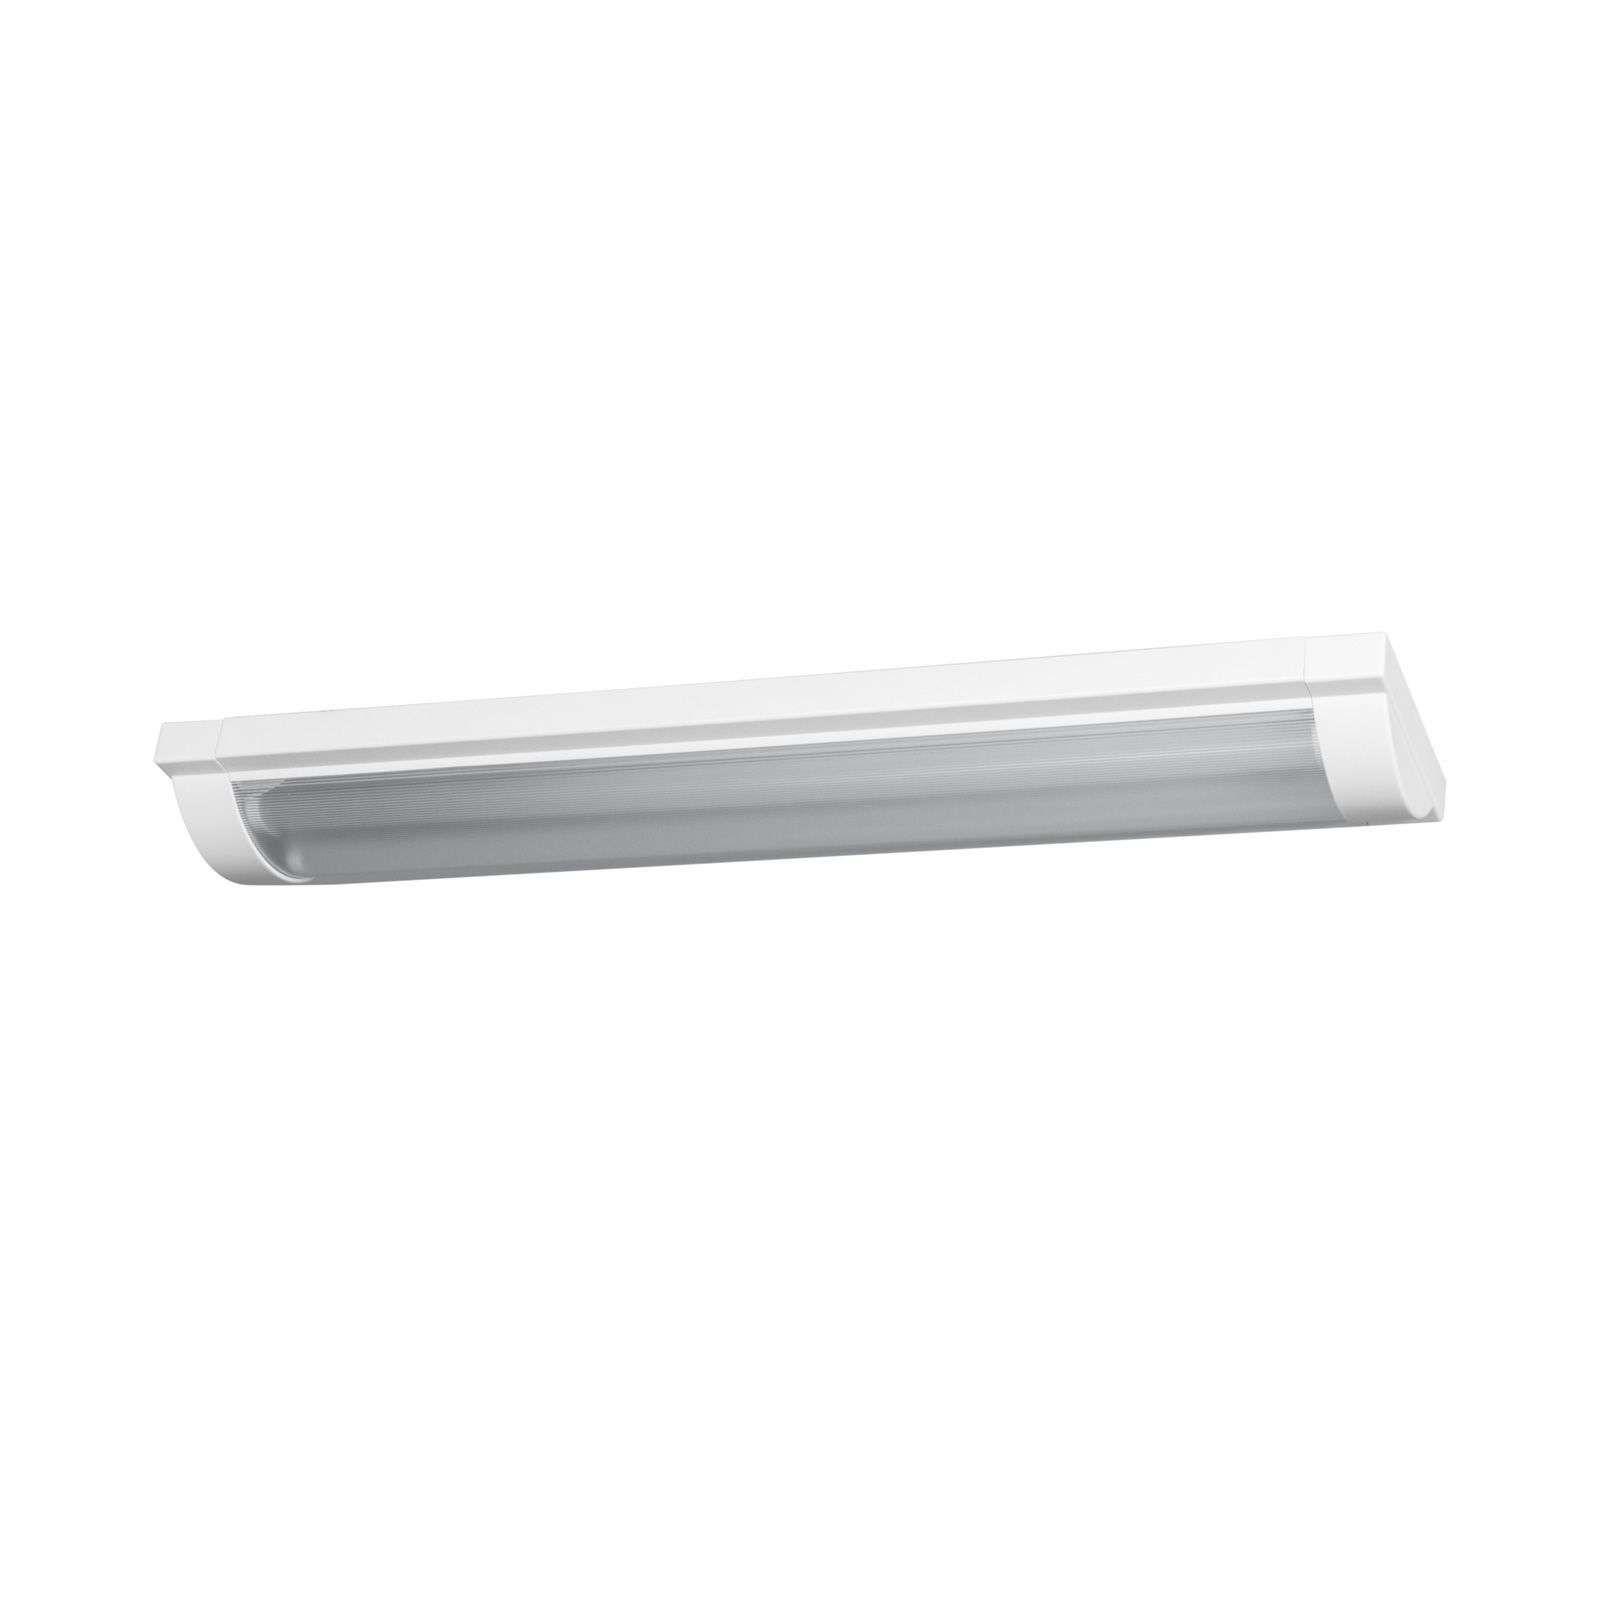 Ledvance Office Line Deckenleuchte Dimmbar 60 Cm Led Deckenstrahler Led Deckenlampen Und Led Deckenleuchte